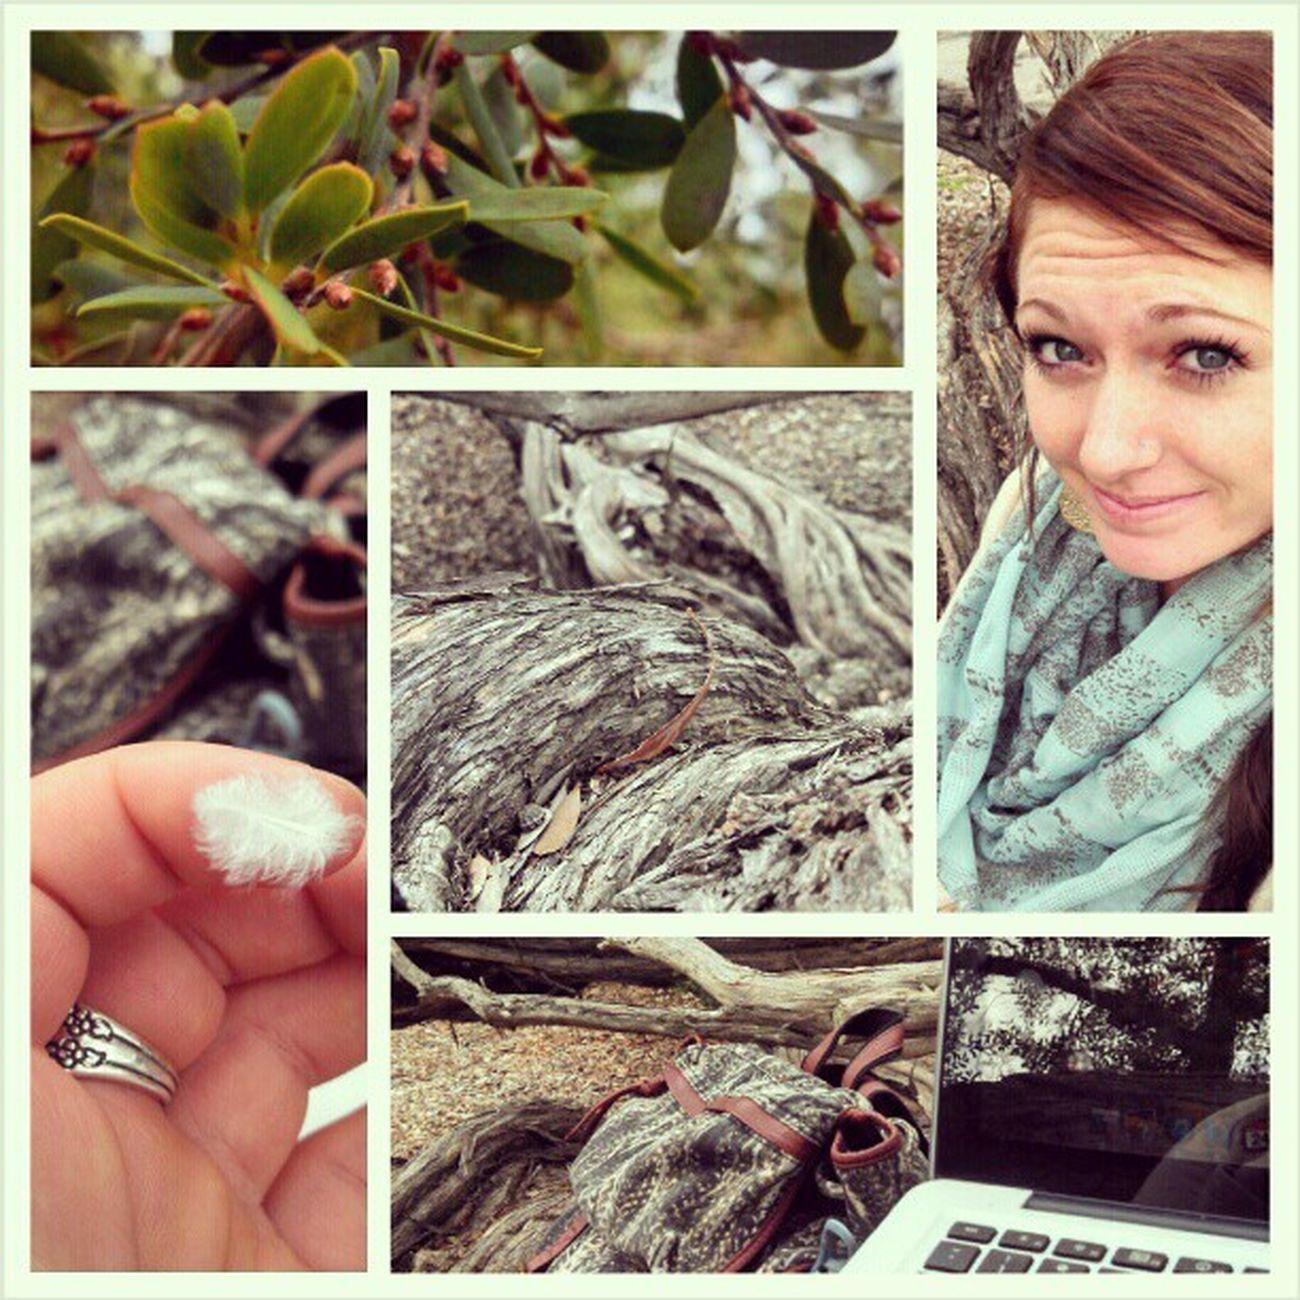 New favorite study spot Inatree Birdies Naturelove Hippiester rainyday thegrasswaswet nowmybutthurts worthit